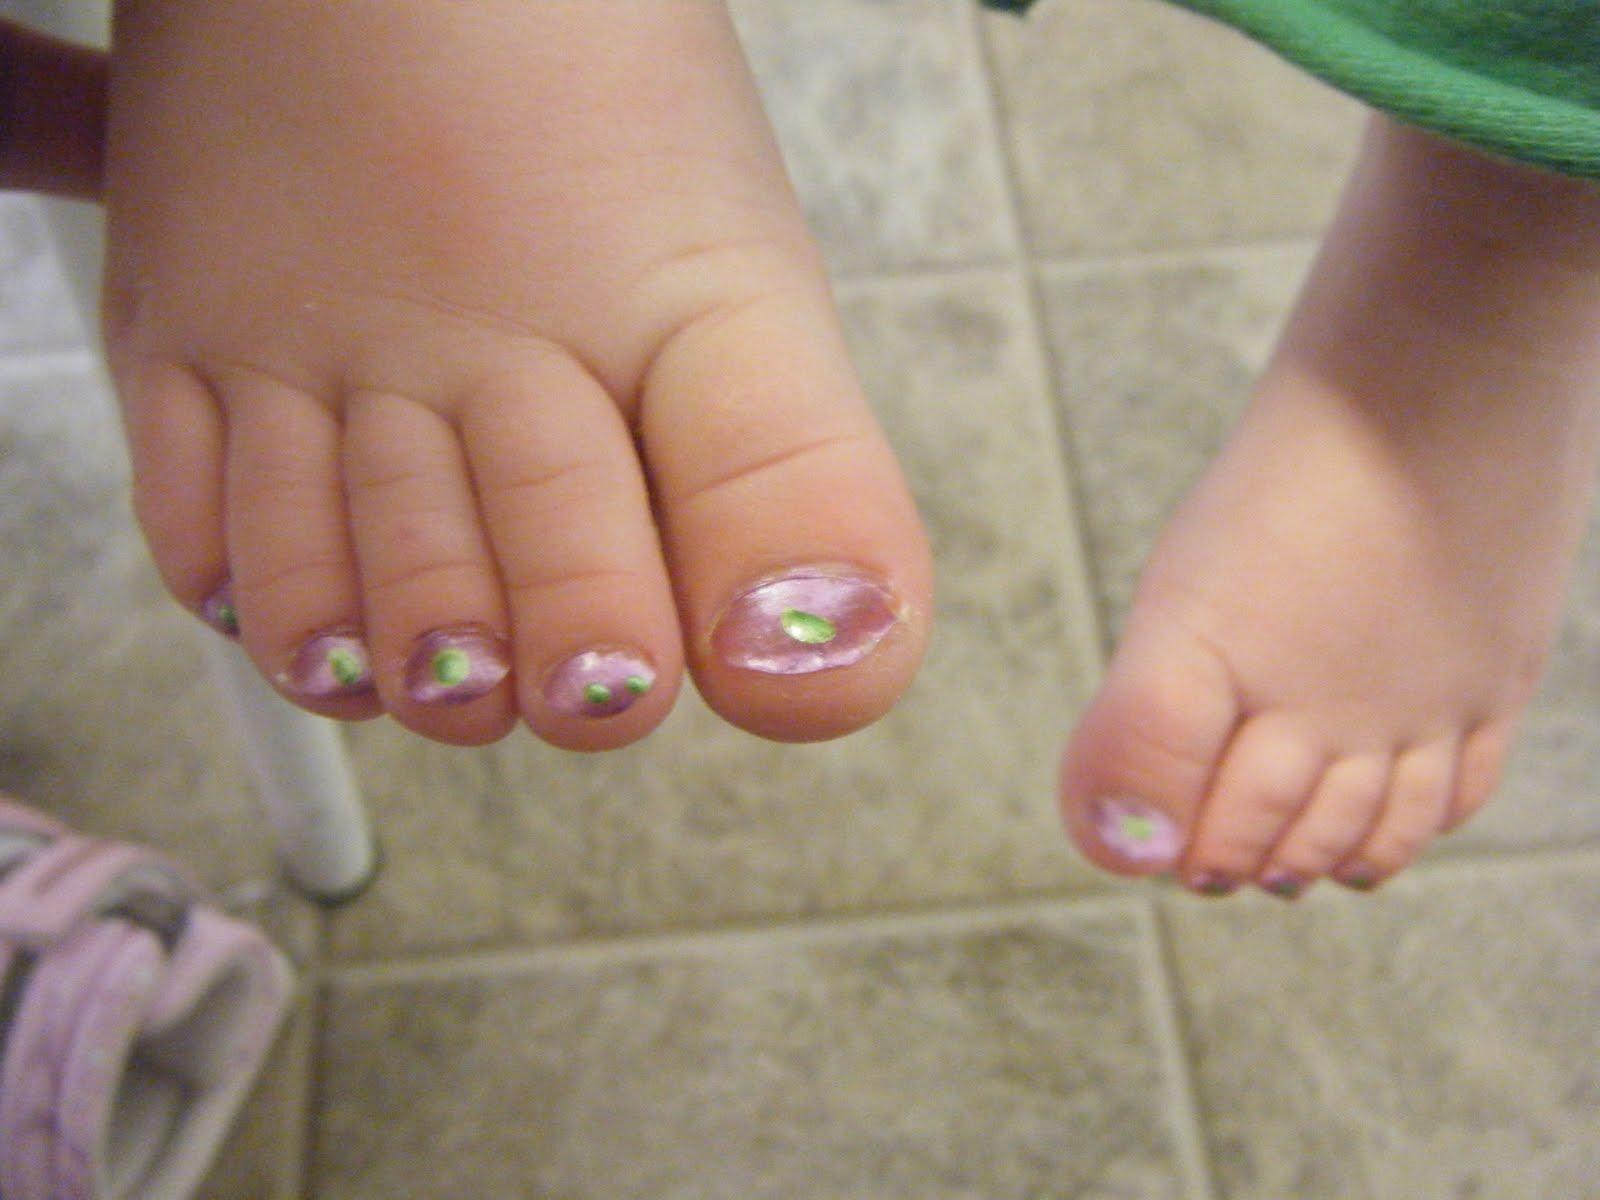 Girls Feet Nail Polish